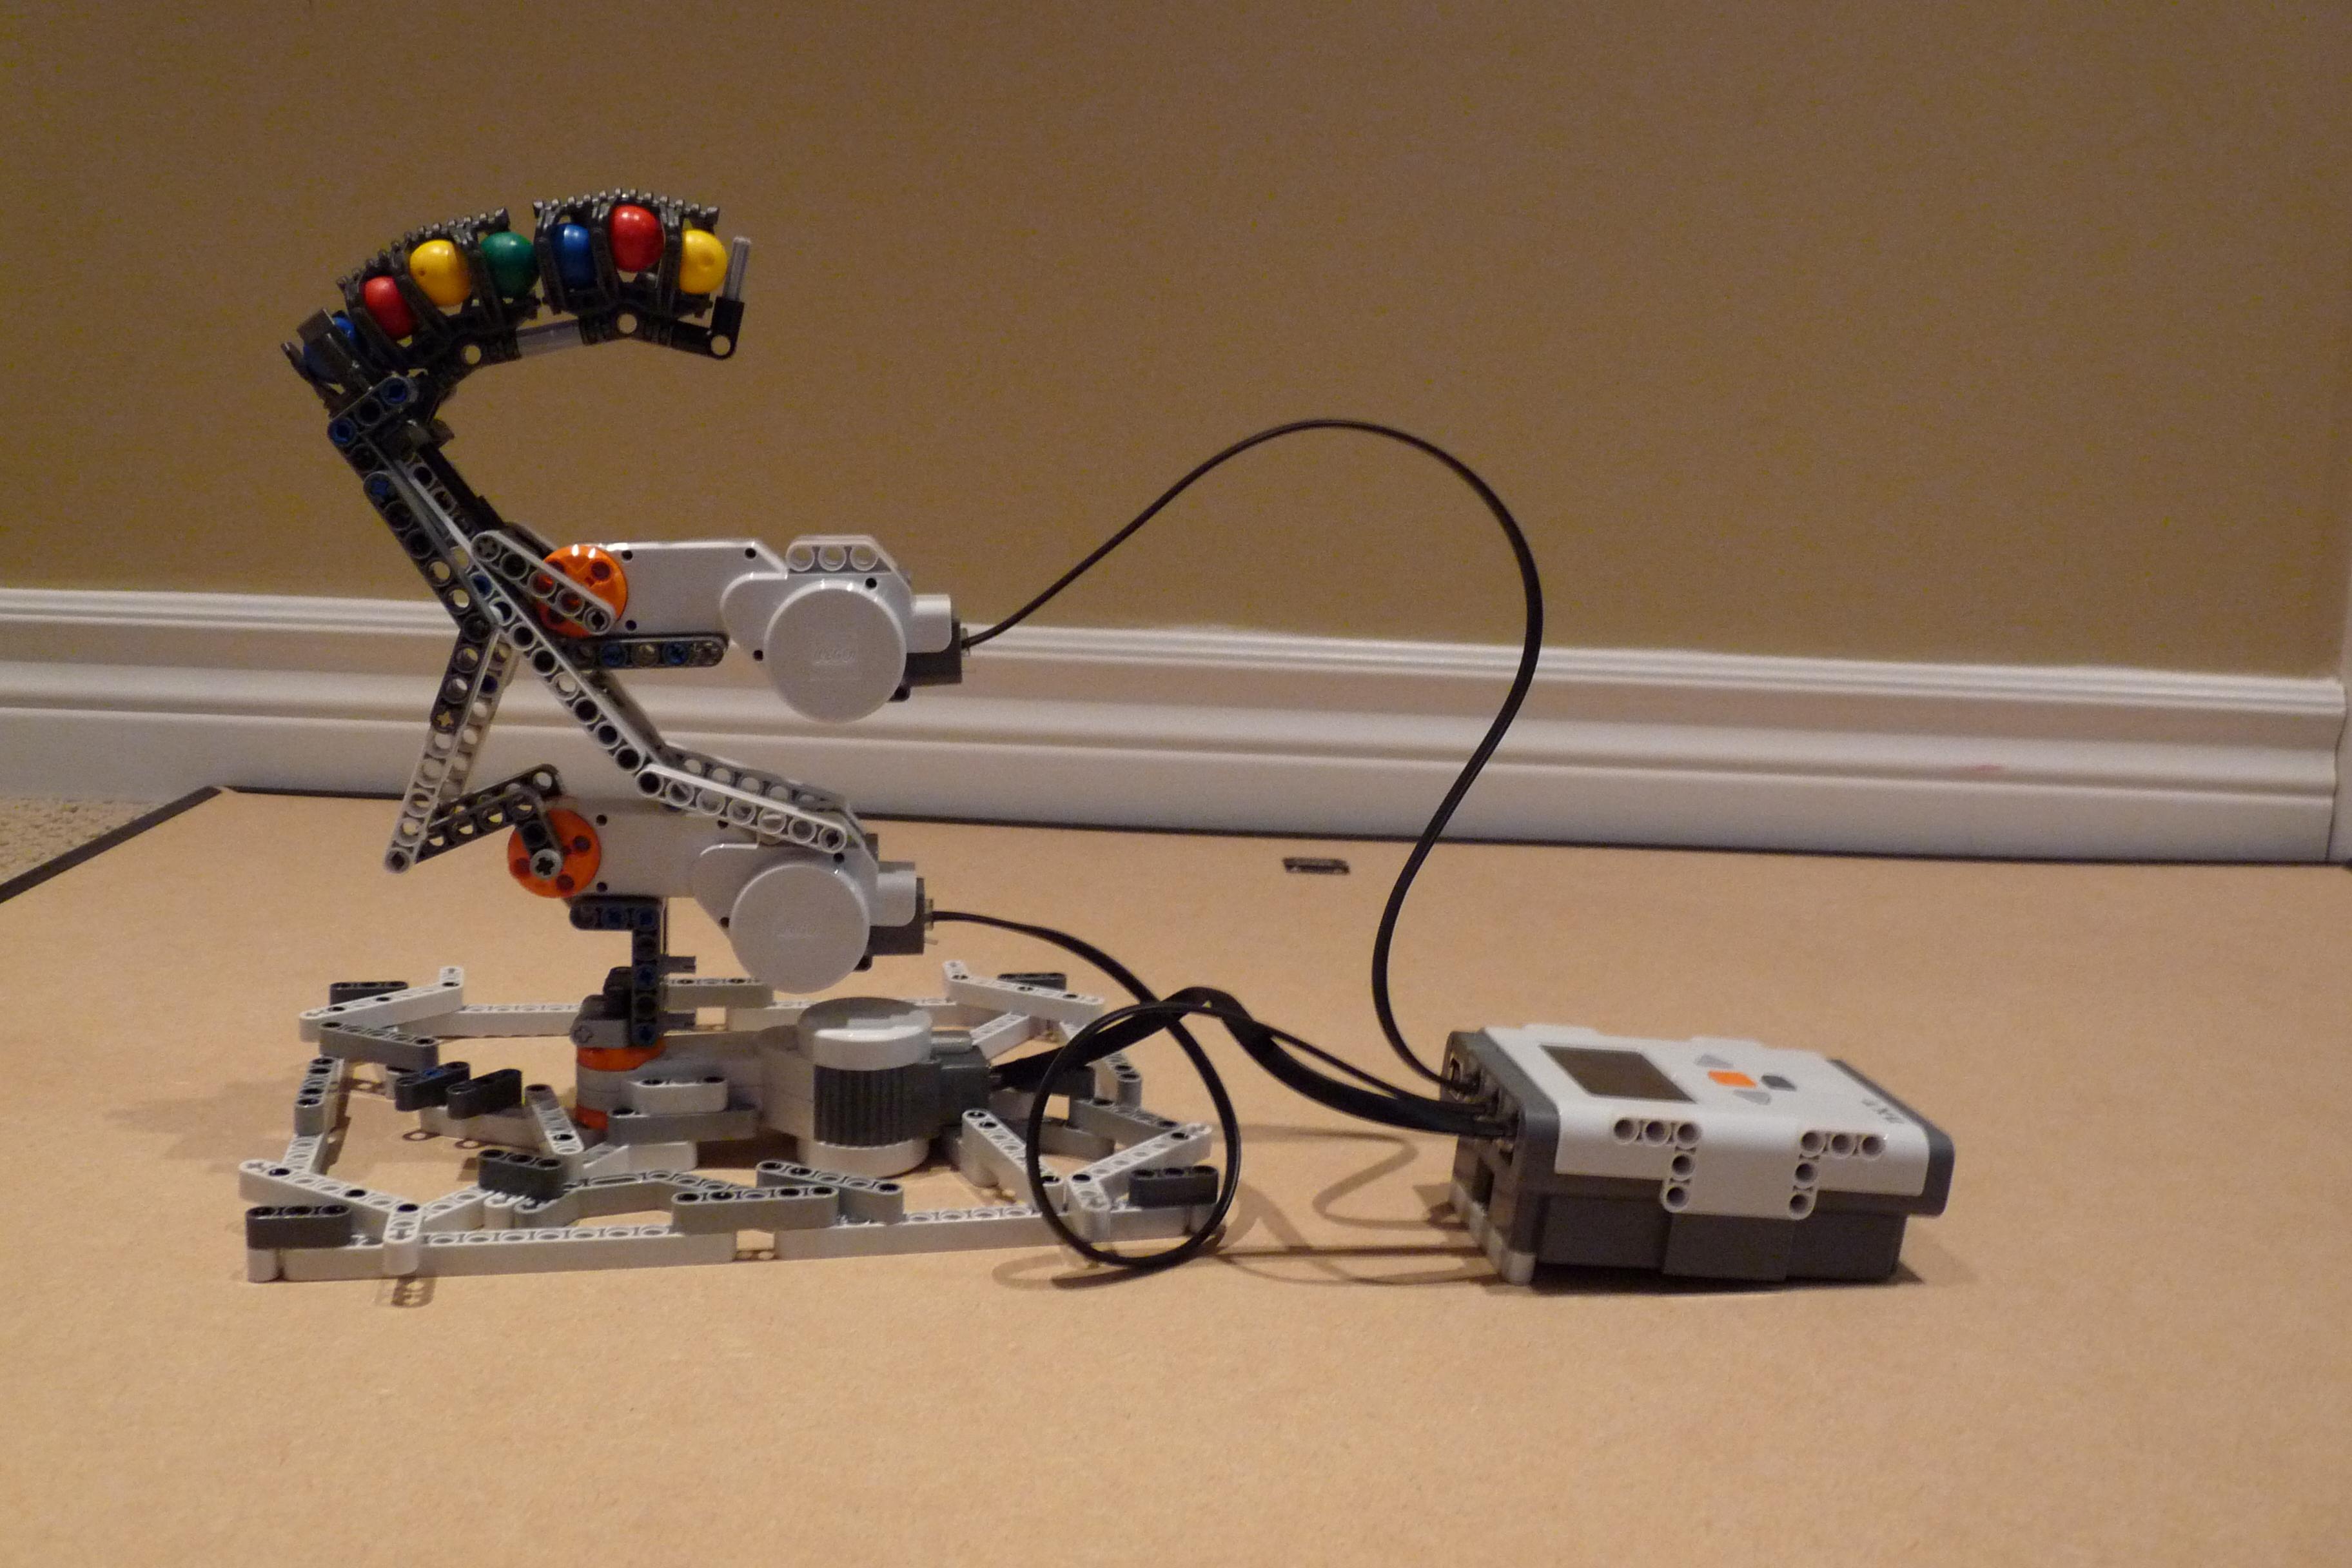 Picture of Lego Mindstorm Turret Shooter